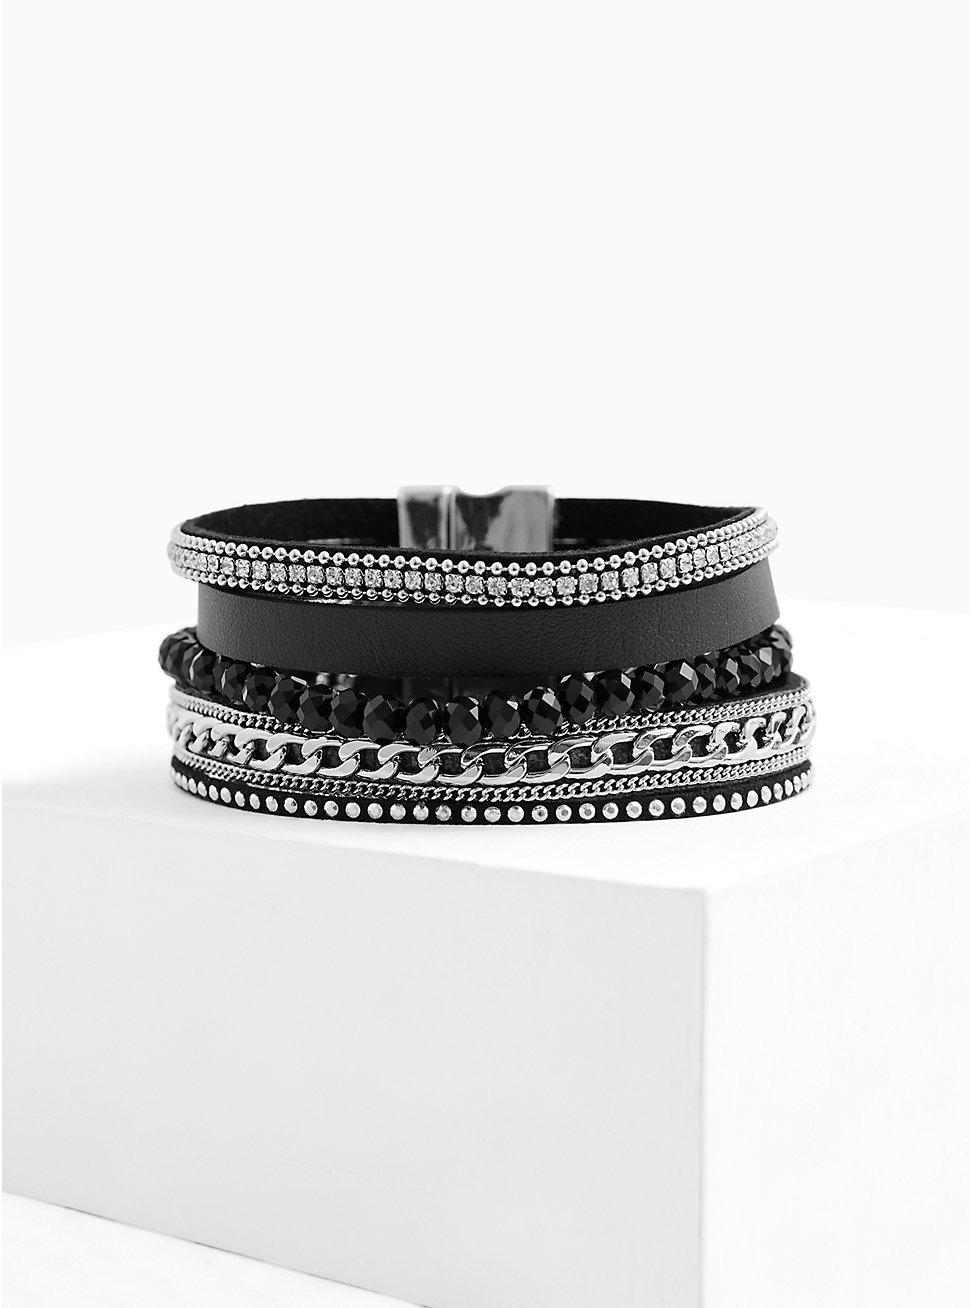 Black Faux Leather & Chain-Link Magnetic Bracelet, BLACK, hi-res